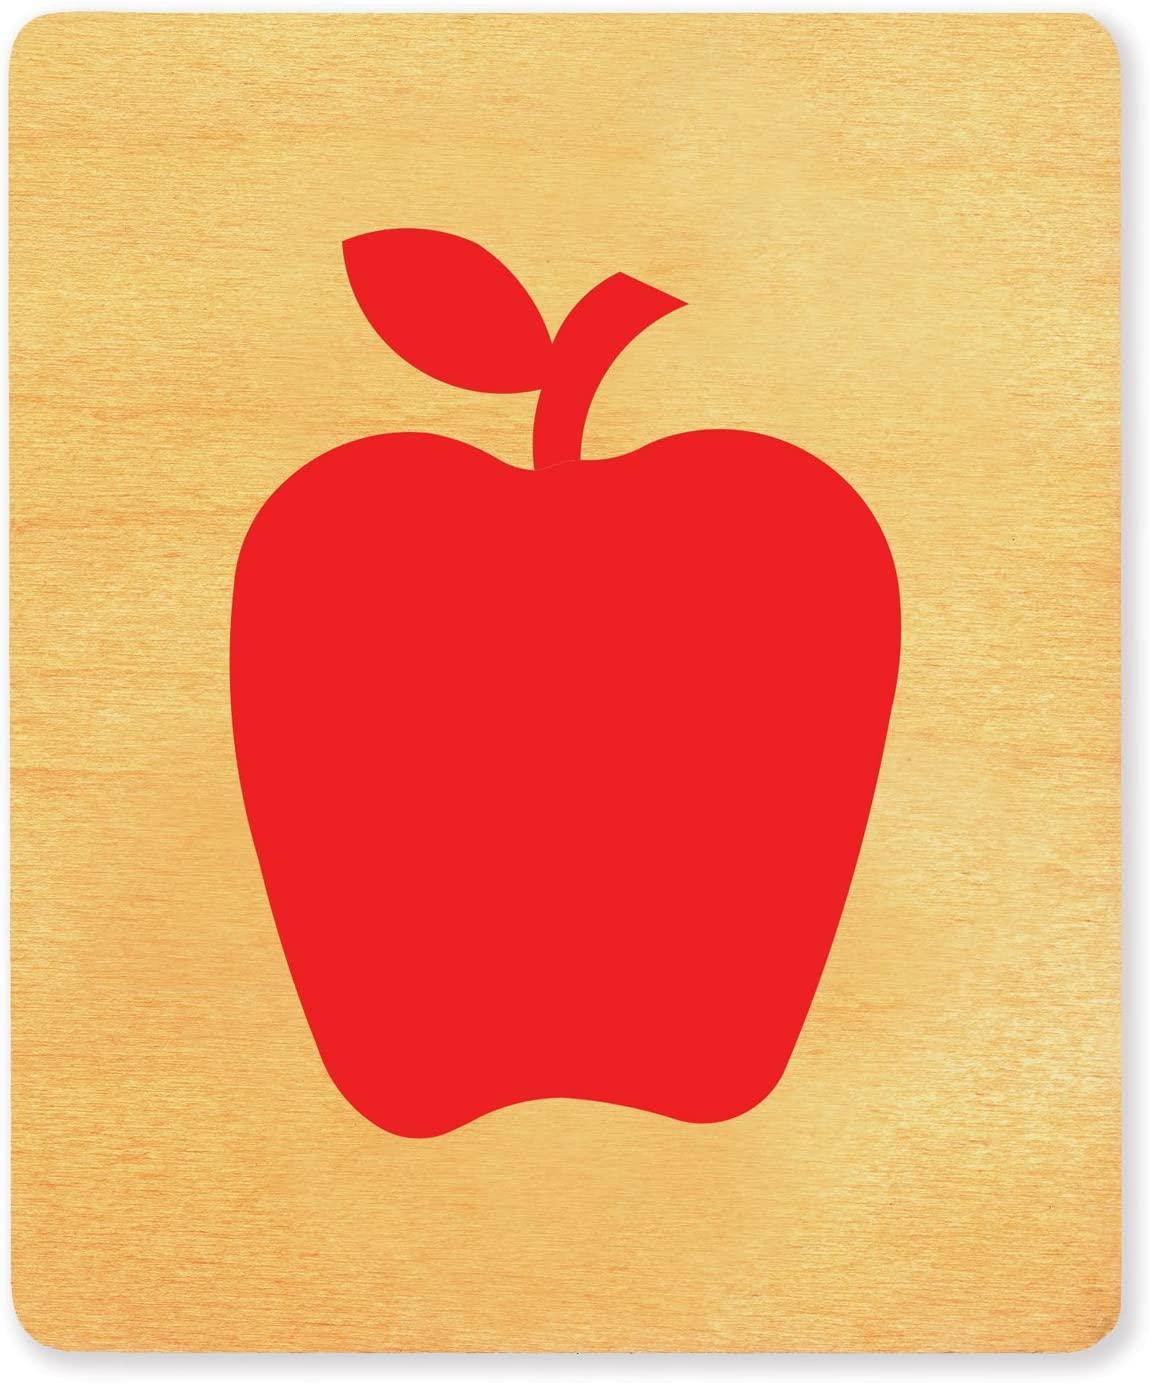 Ellison SureCut Die 12078-LG, Apple, 5 7/8